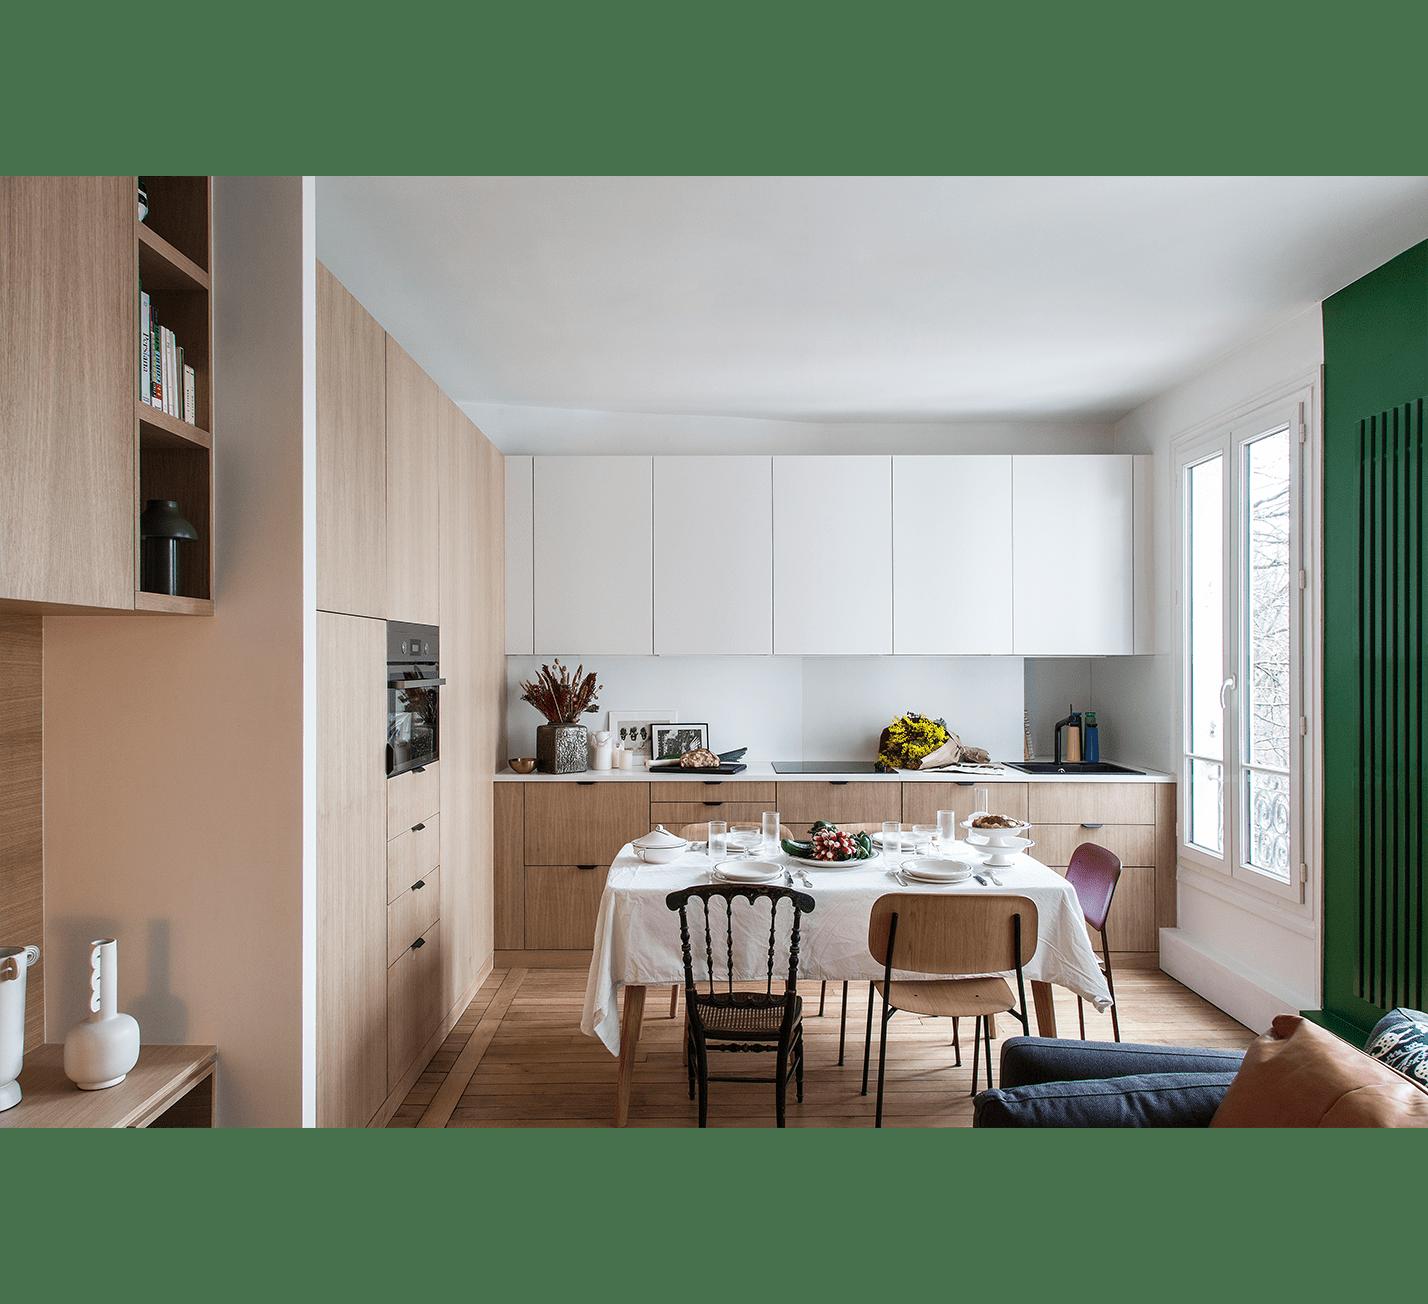 Projet-Cavallotti-Atelier-Steve-Pauline-Borgia-Architecte-interieur-03-min